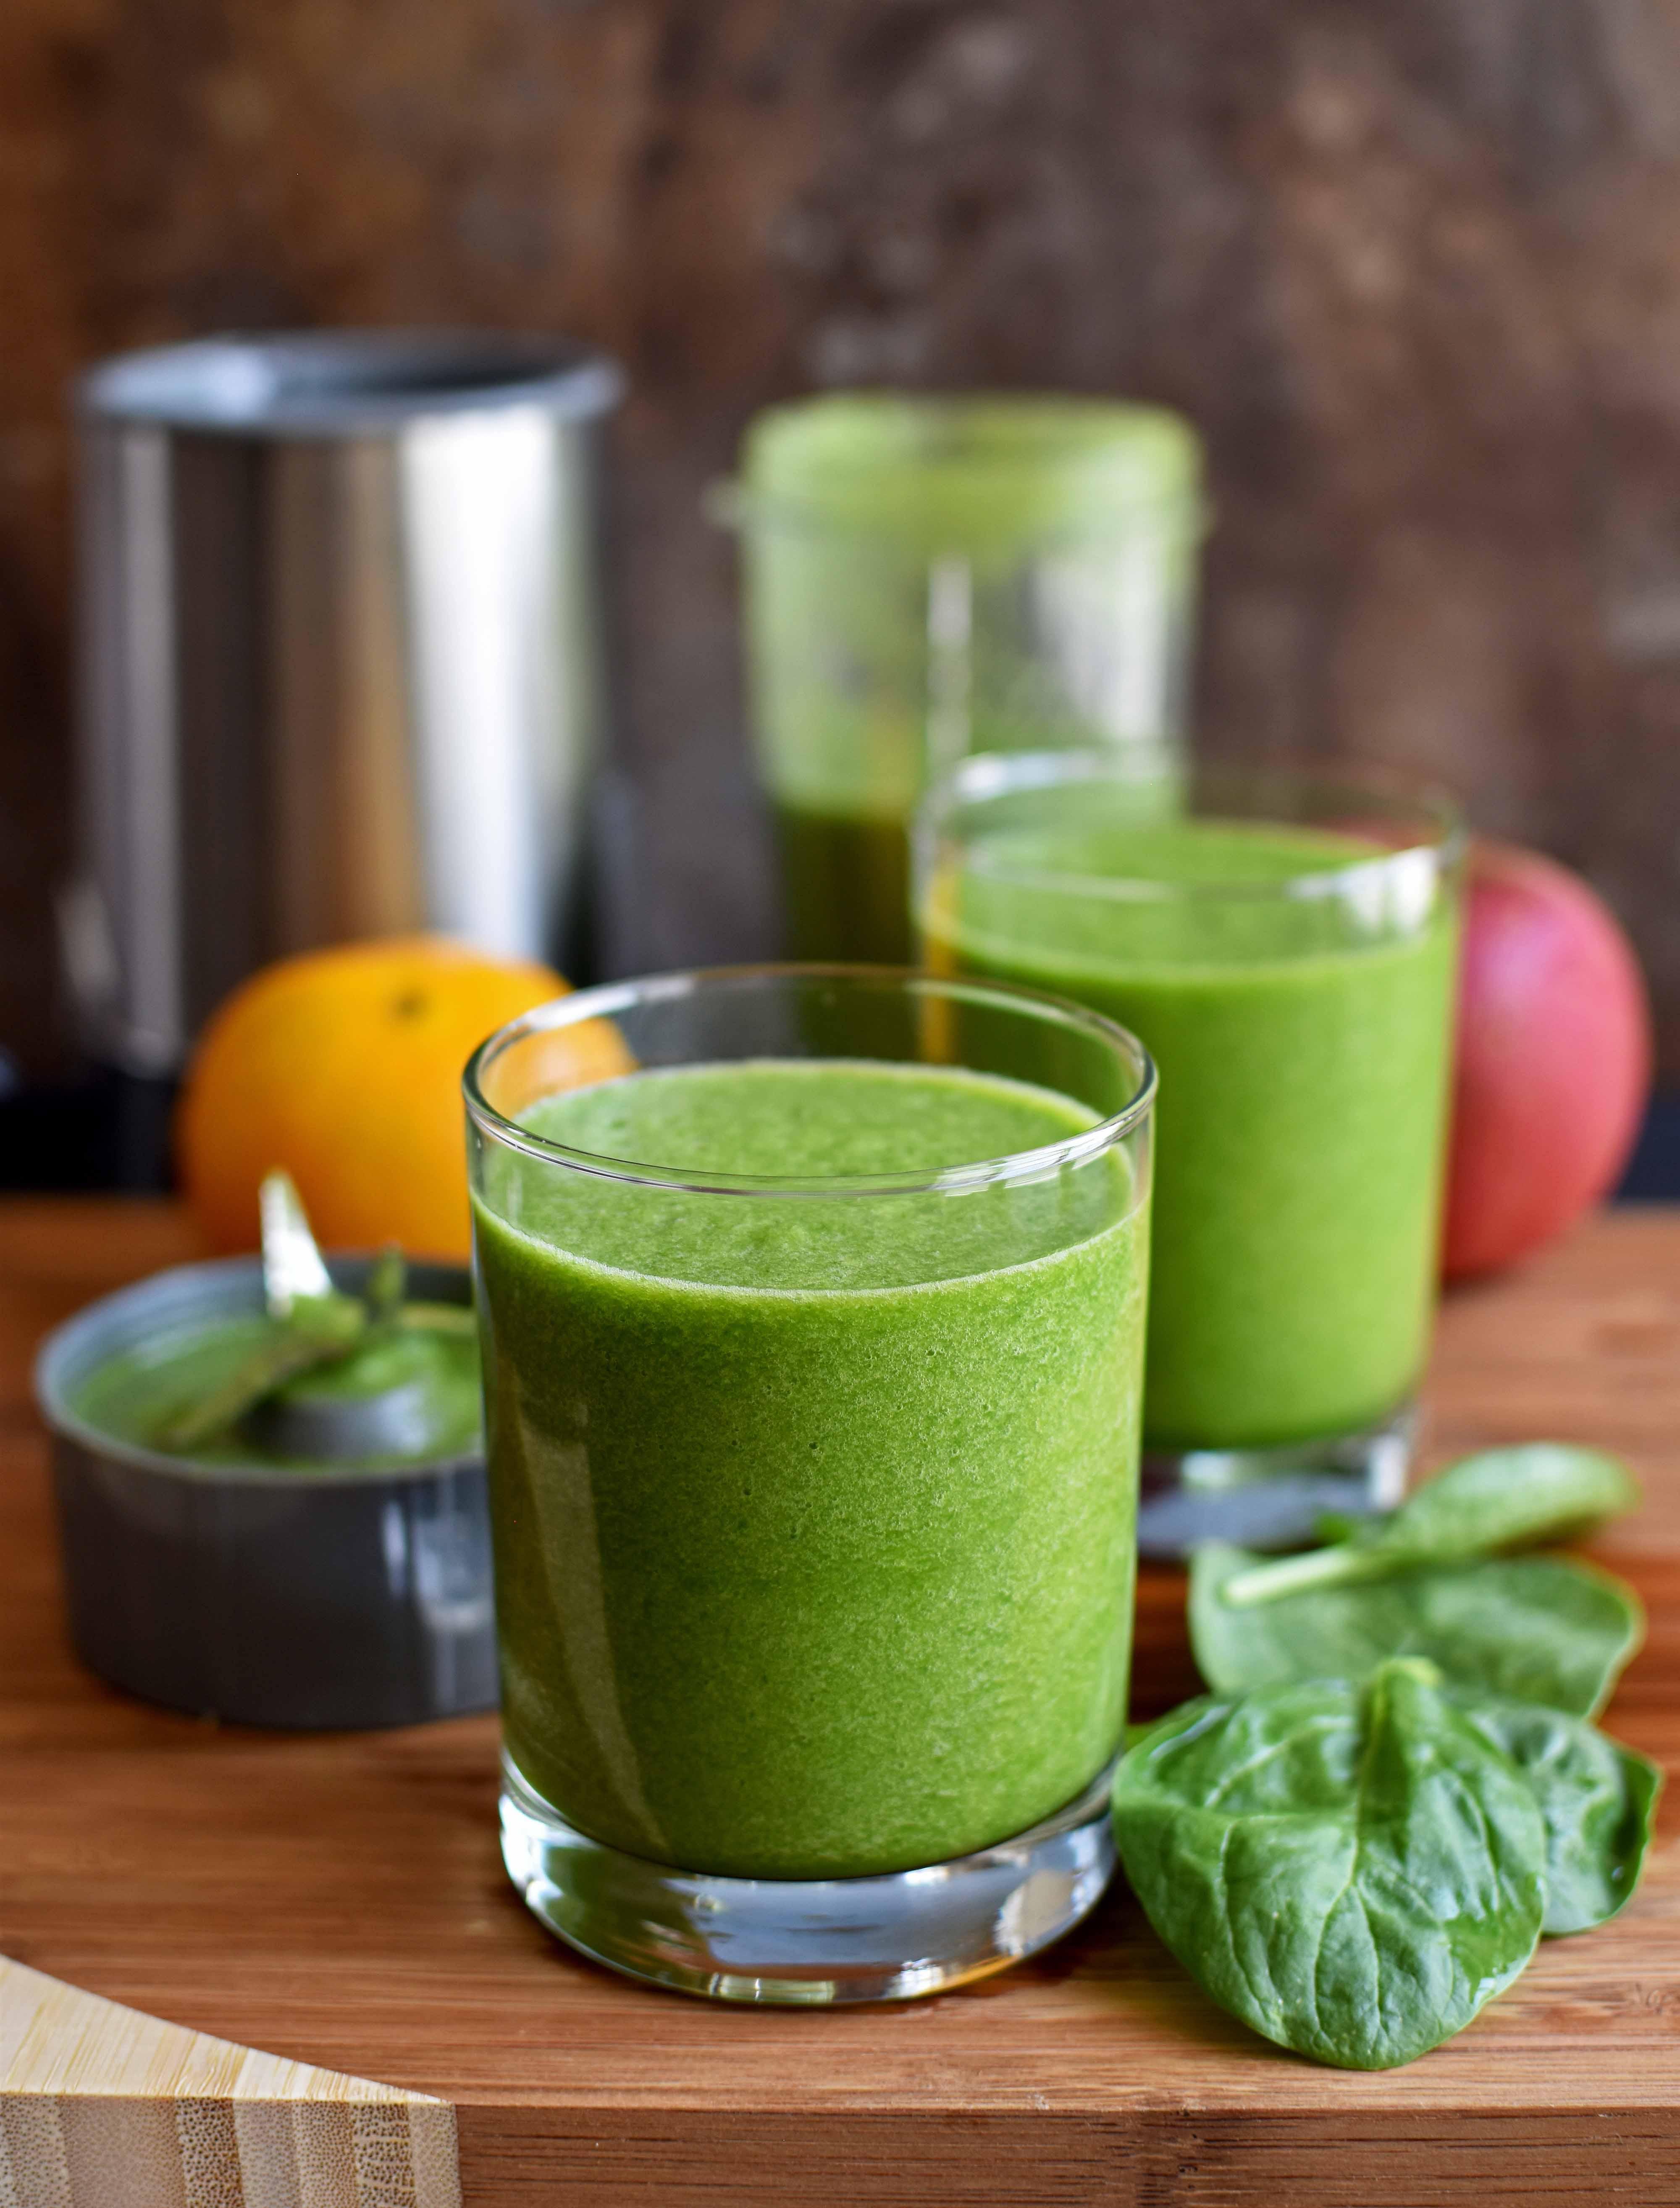 Green Smoothie - Pepper Delight #pepperdelightblog #recipe #smoothie #spinach #breakfastsmoothie